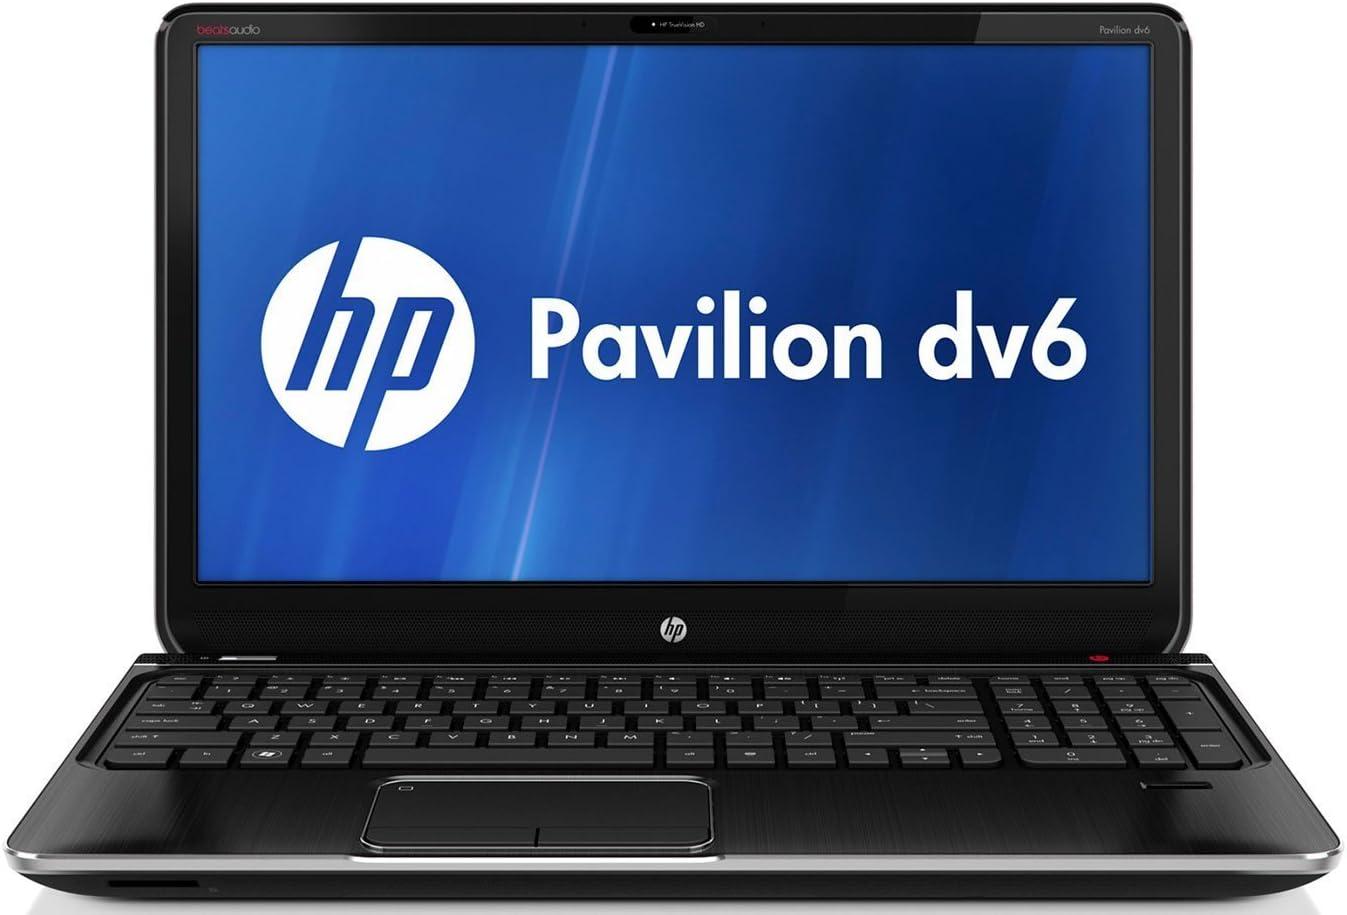 "HP Pavilion dv6t-7000 Quad Edition Entertainment Notebook PC (dv6tqe) 15.6"" Laptop / 3rd generation Intel Core i7-3610QM Processor (IVY BRIDGE) / 1GB 630M GDDR3 Graphics / 8GB DDR3 System Memory / 1TB 5400RPM Hard Drive / Blu-ray player / Beats Audio / midnight black metal finish"